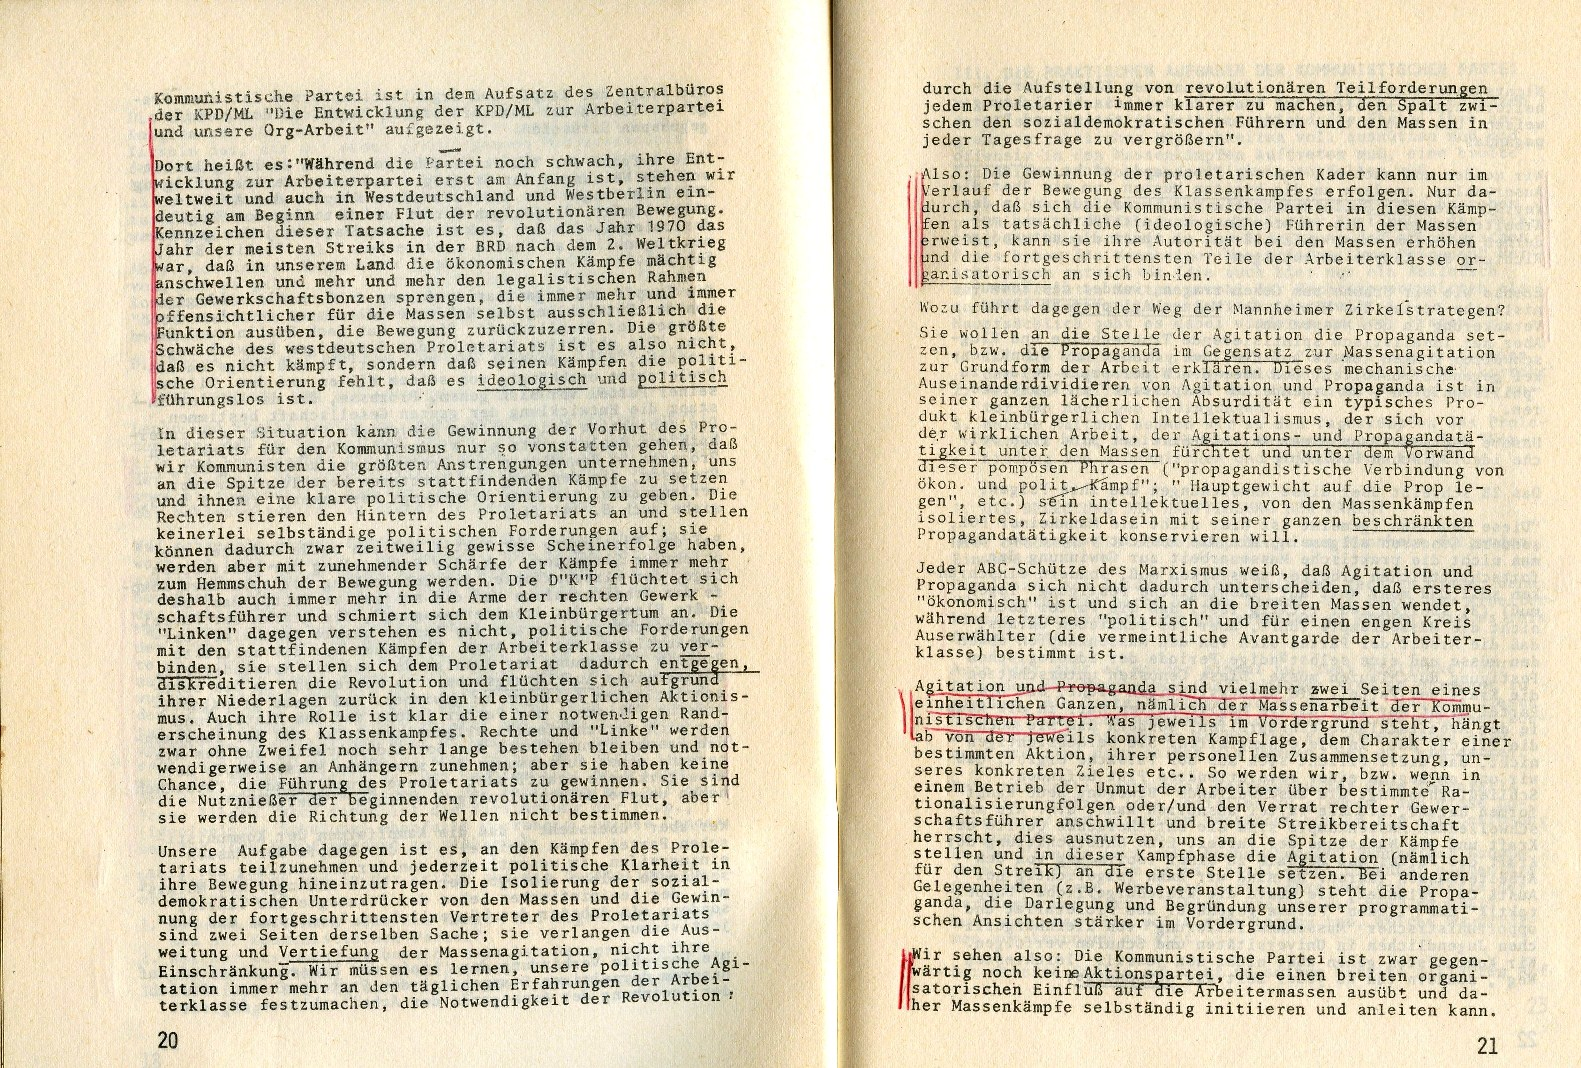 ZB_Parteiarbeiter_1971_05_12